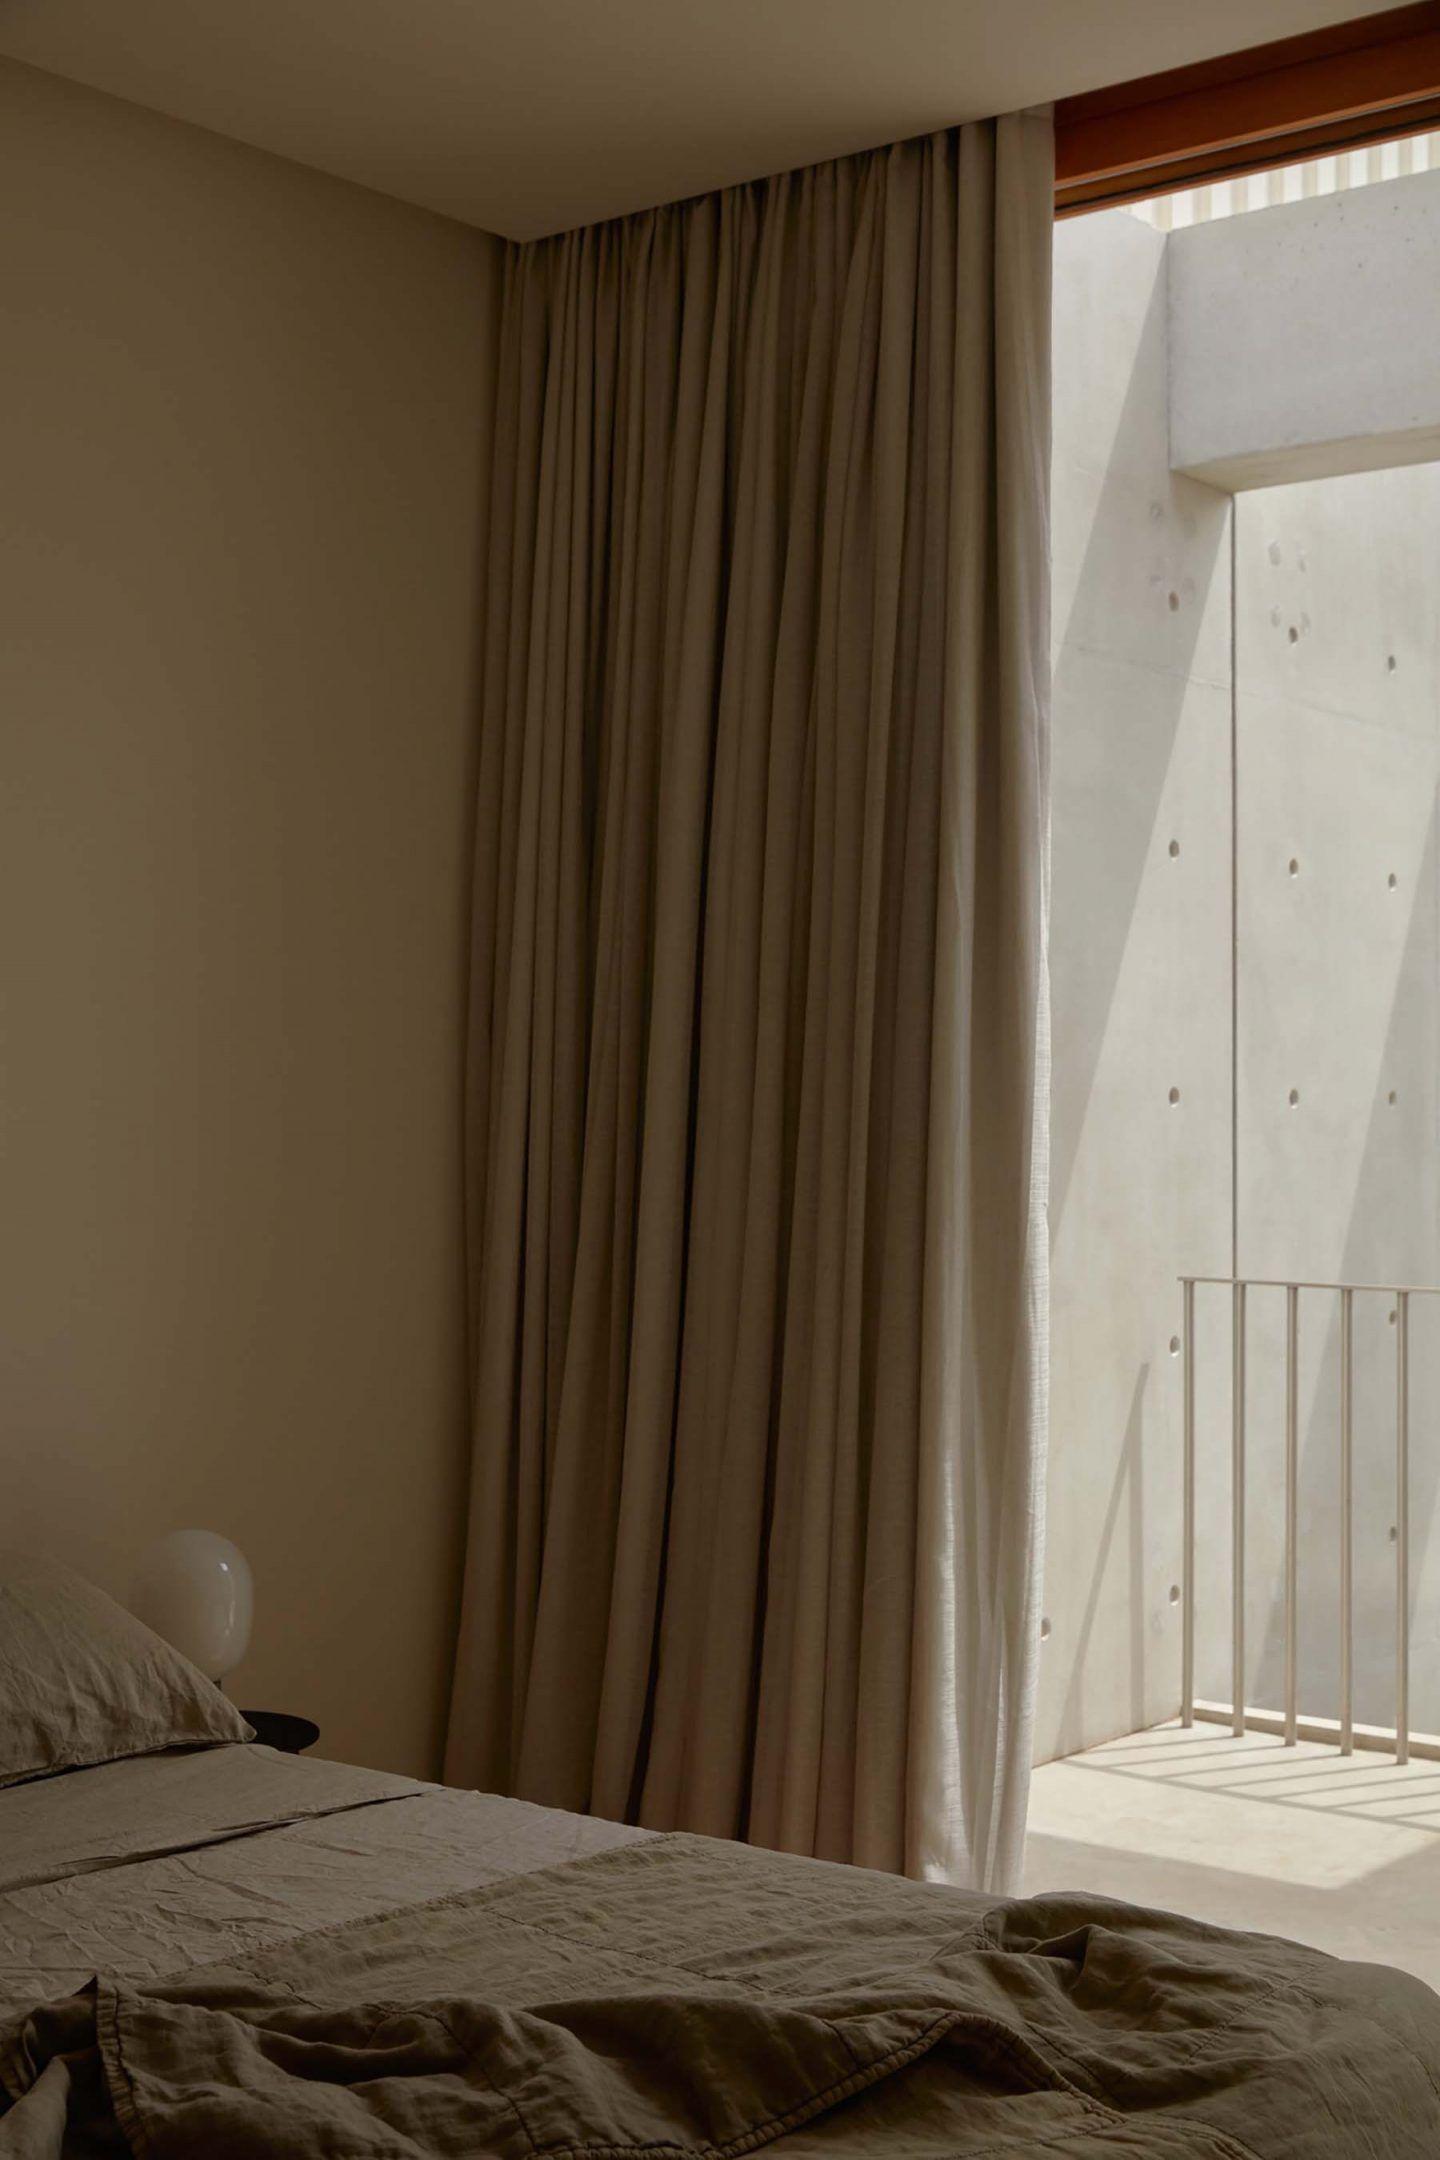 IGNANT-Architecture-Oliver-du-Puy-Architects-Skinny-House-6